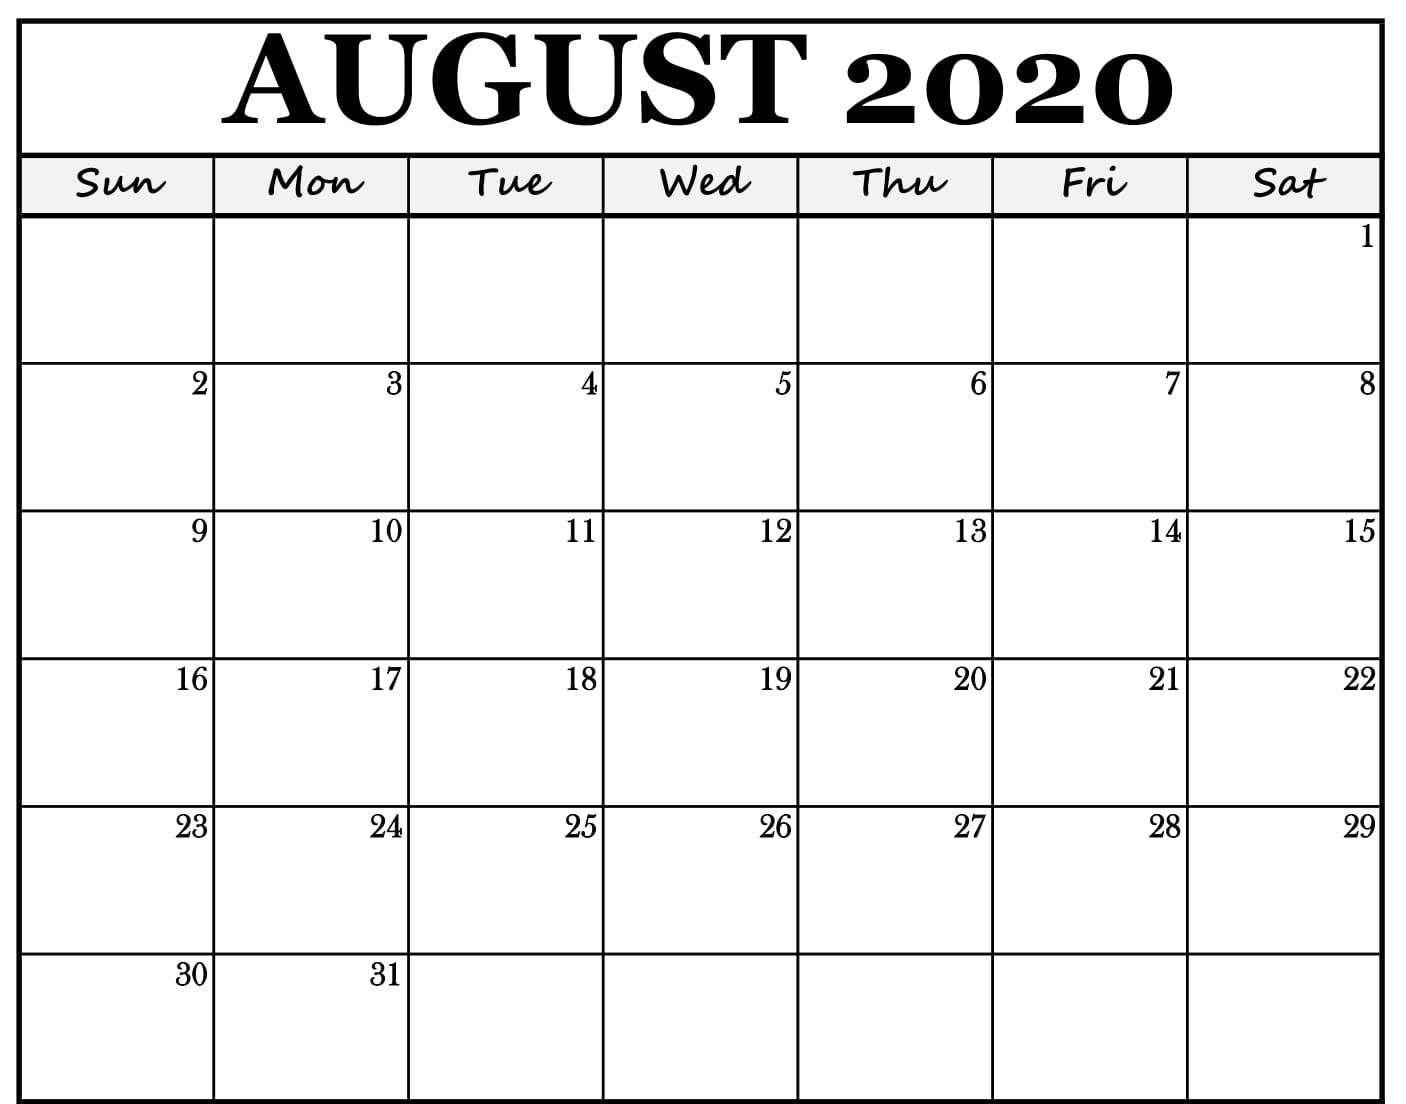 Fillable August 2020 Calendar | Fillable Calendar, Free